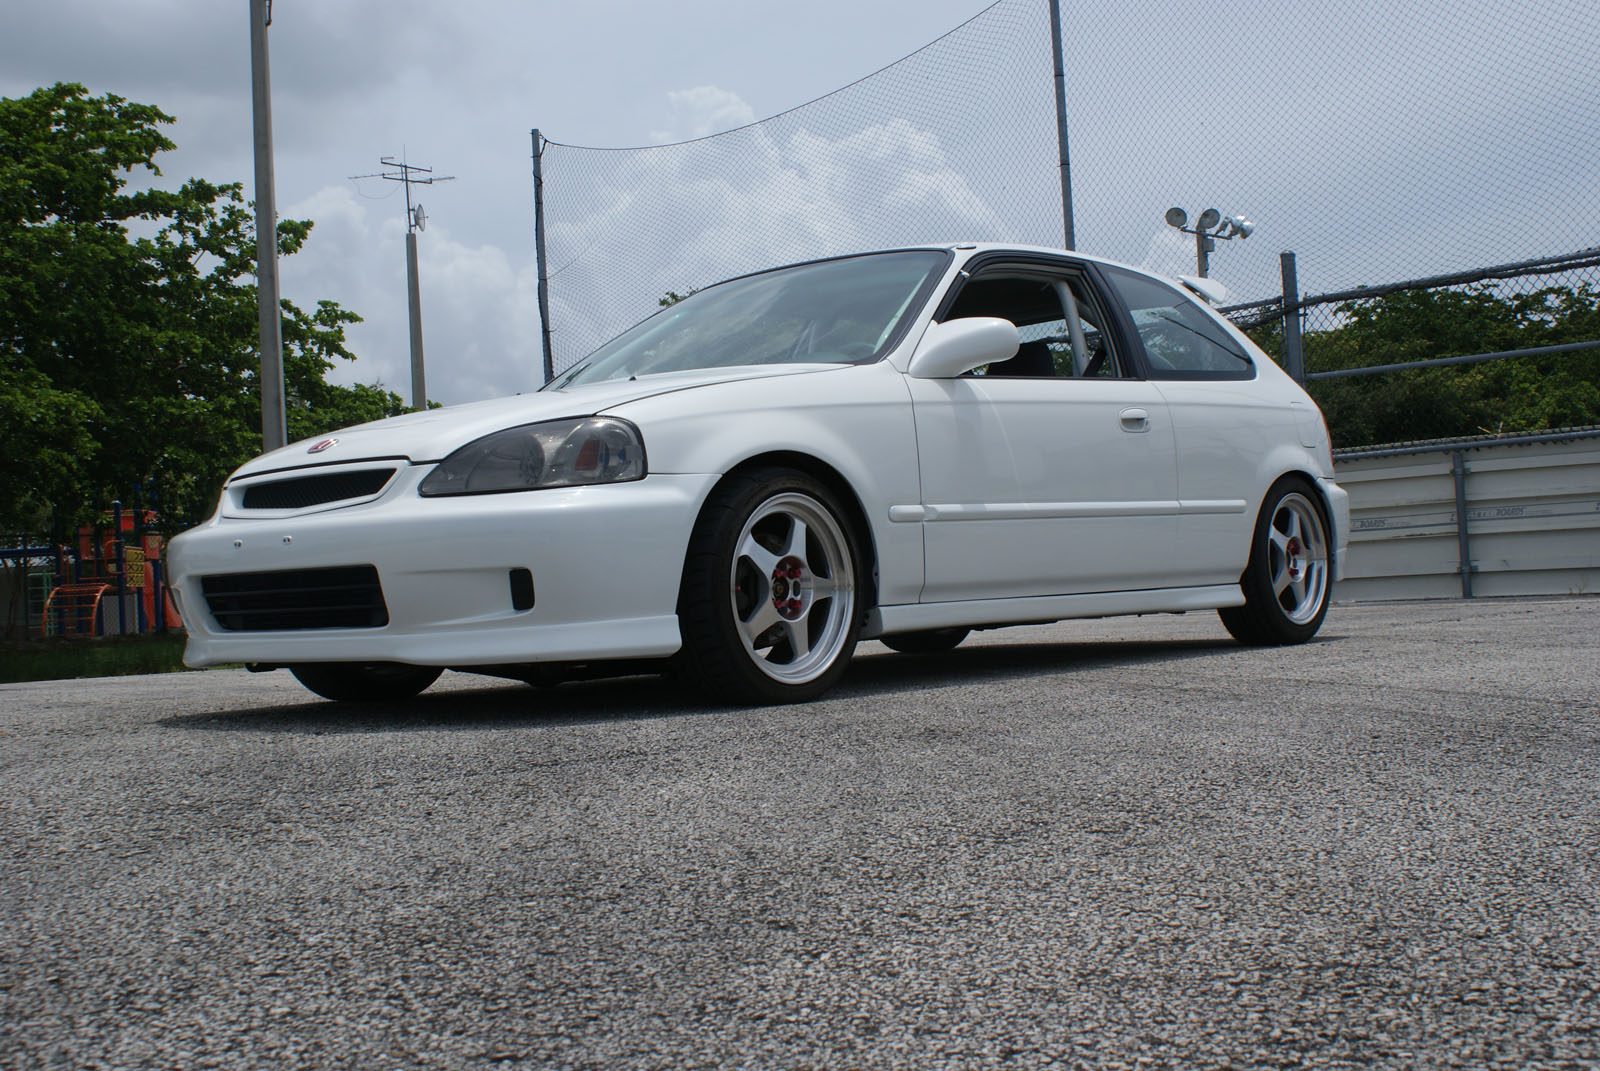 1997 Honda Civic SI-R For Sale | Pompano Beach Florida